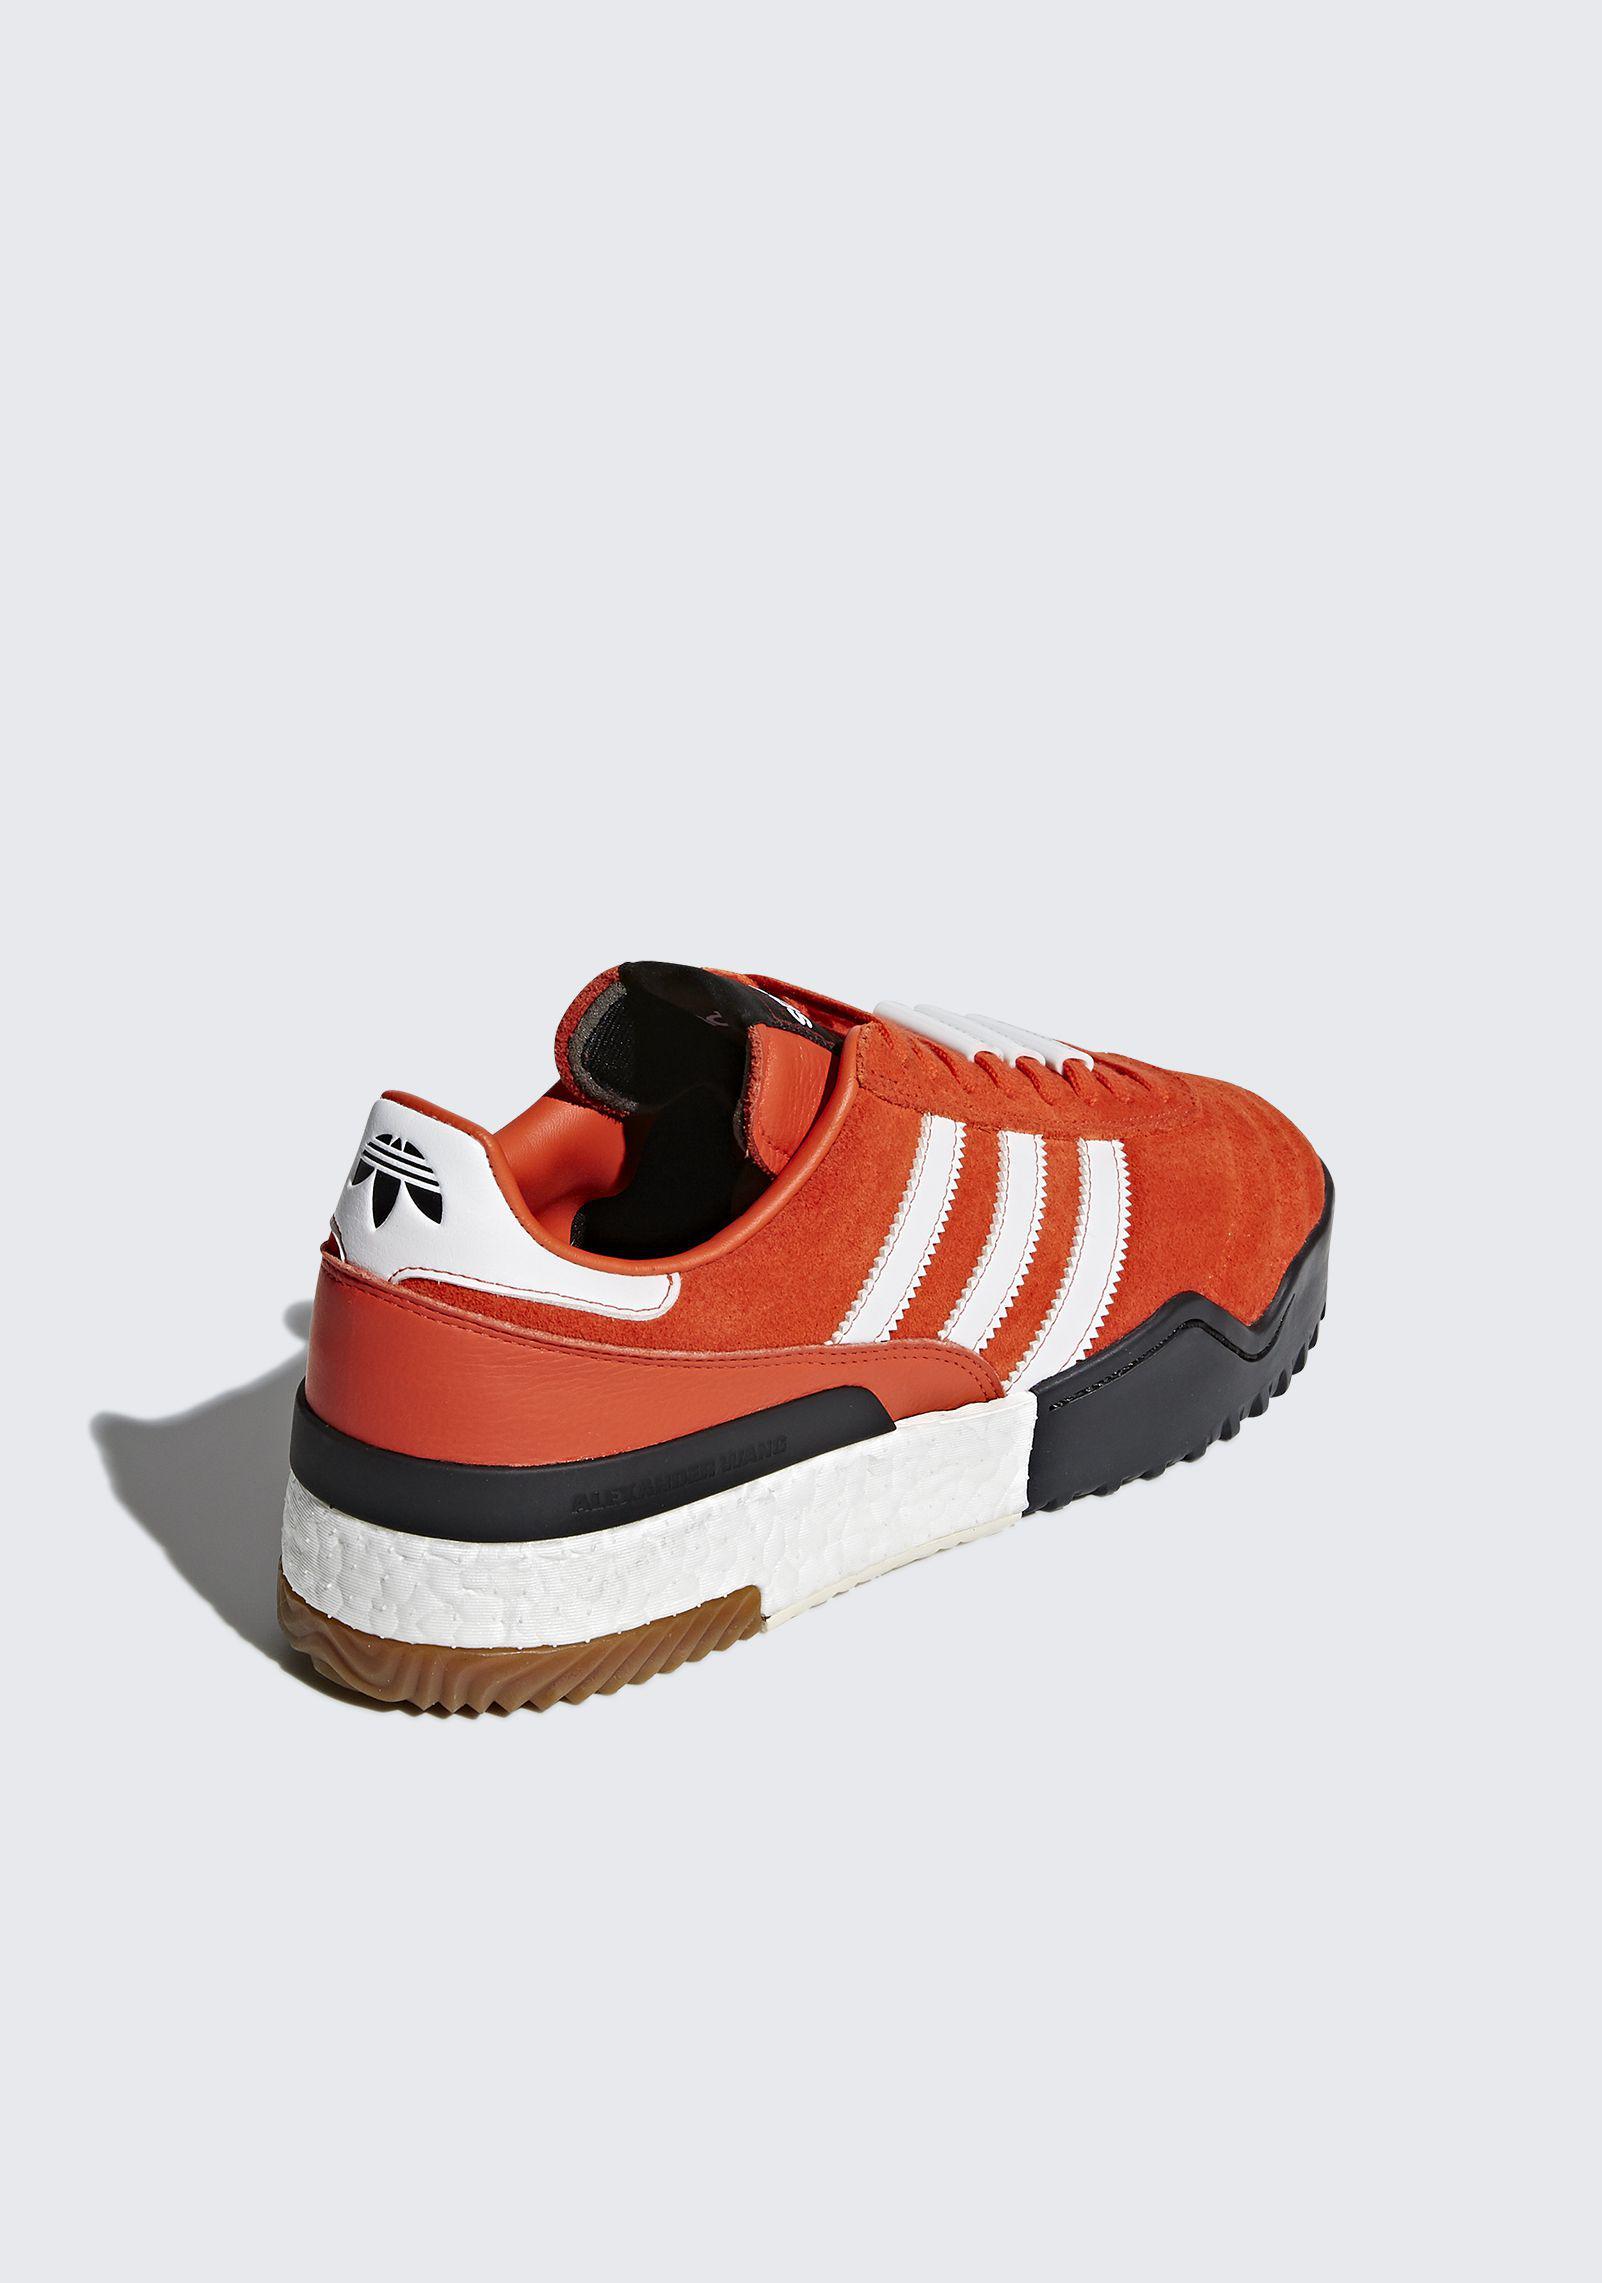 detailed look 8ecbf a9f6b Lyst - Alexander Wang Adidas Originals By Aw Bball Soccer Sh